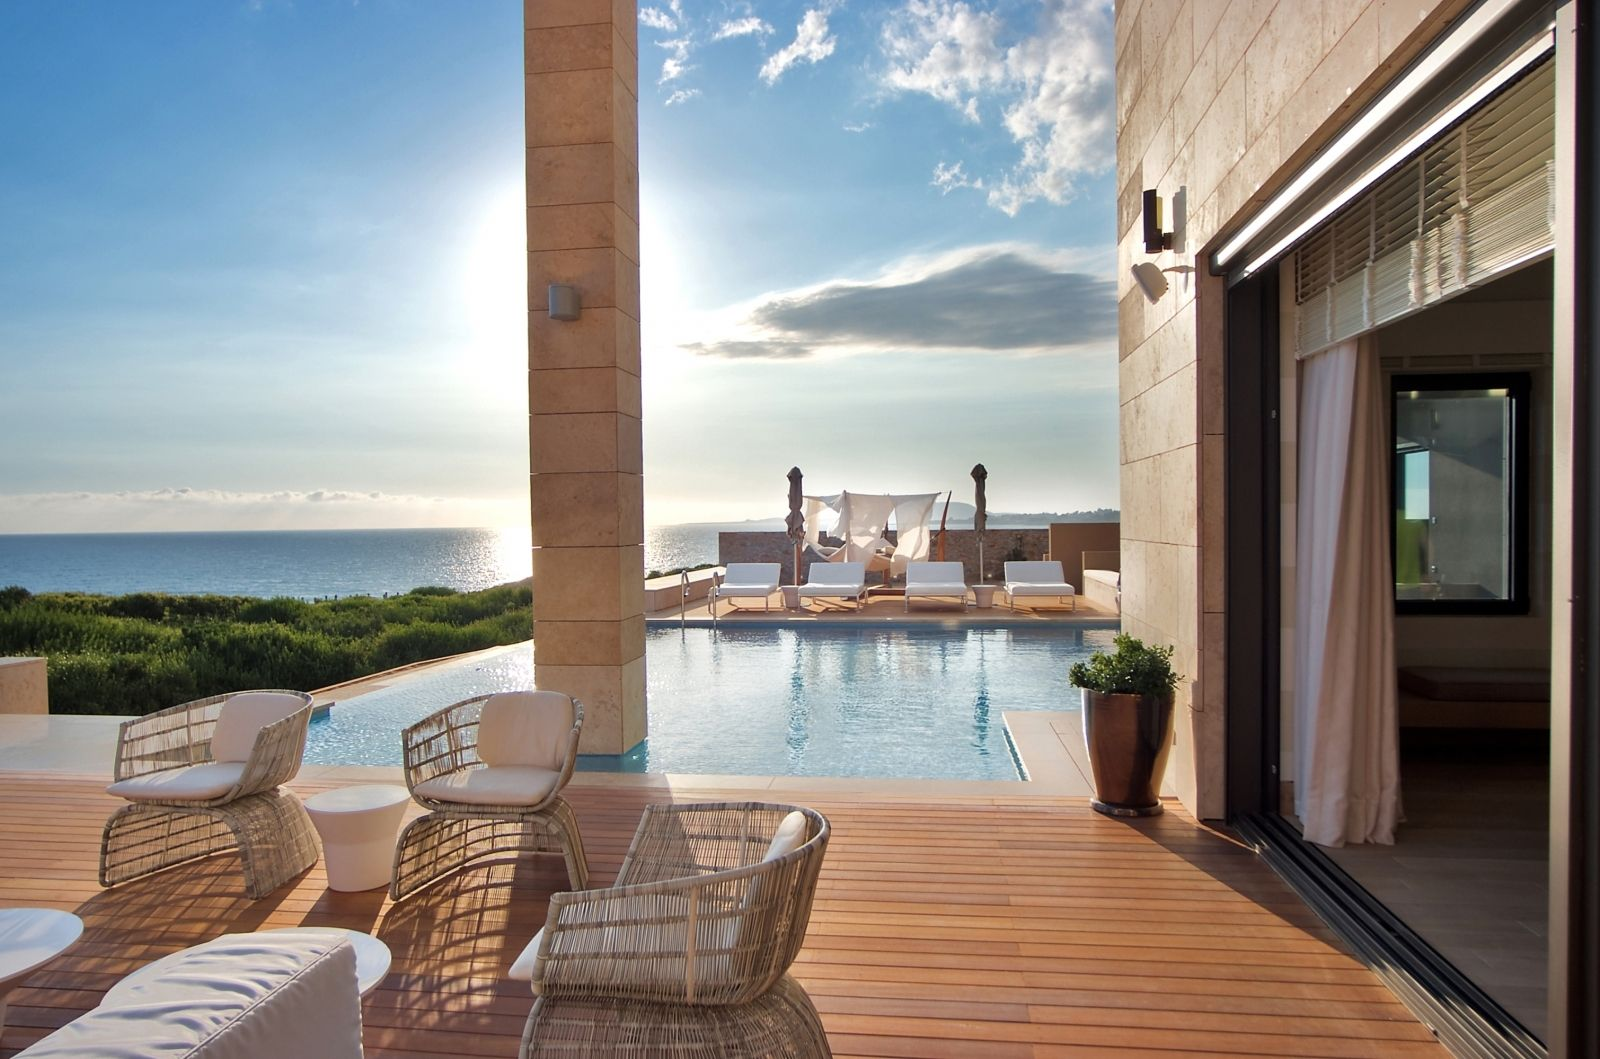 Russians buying luxury Greek villas